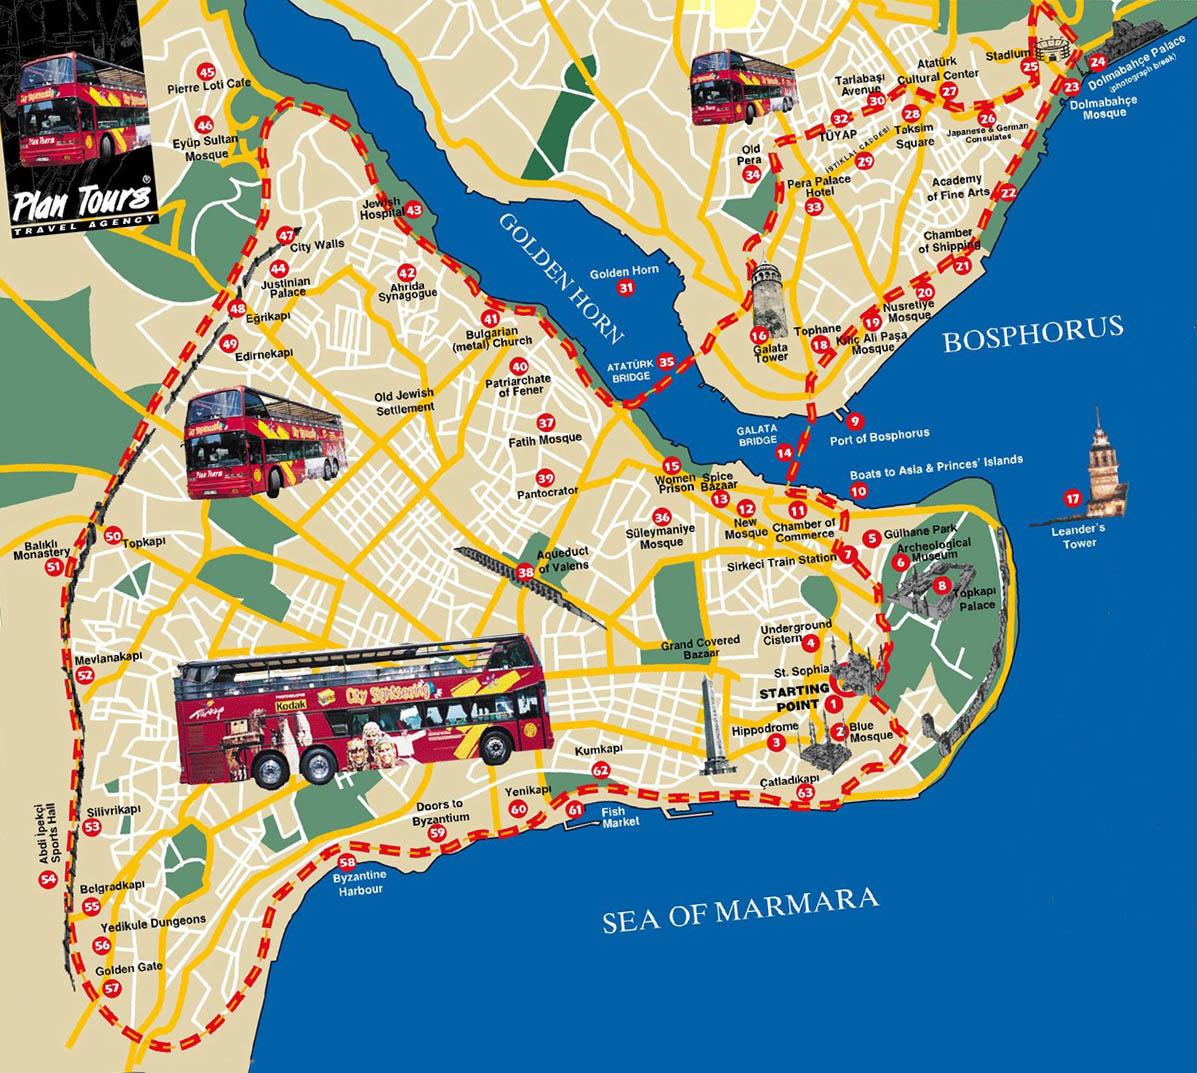 mapa de istambul Mapas de Istambul – Turquia   MapasBlog mapa de istambul